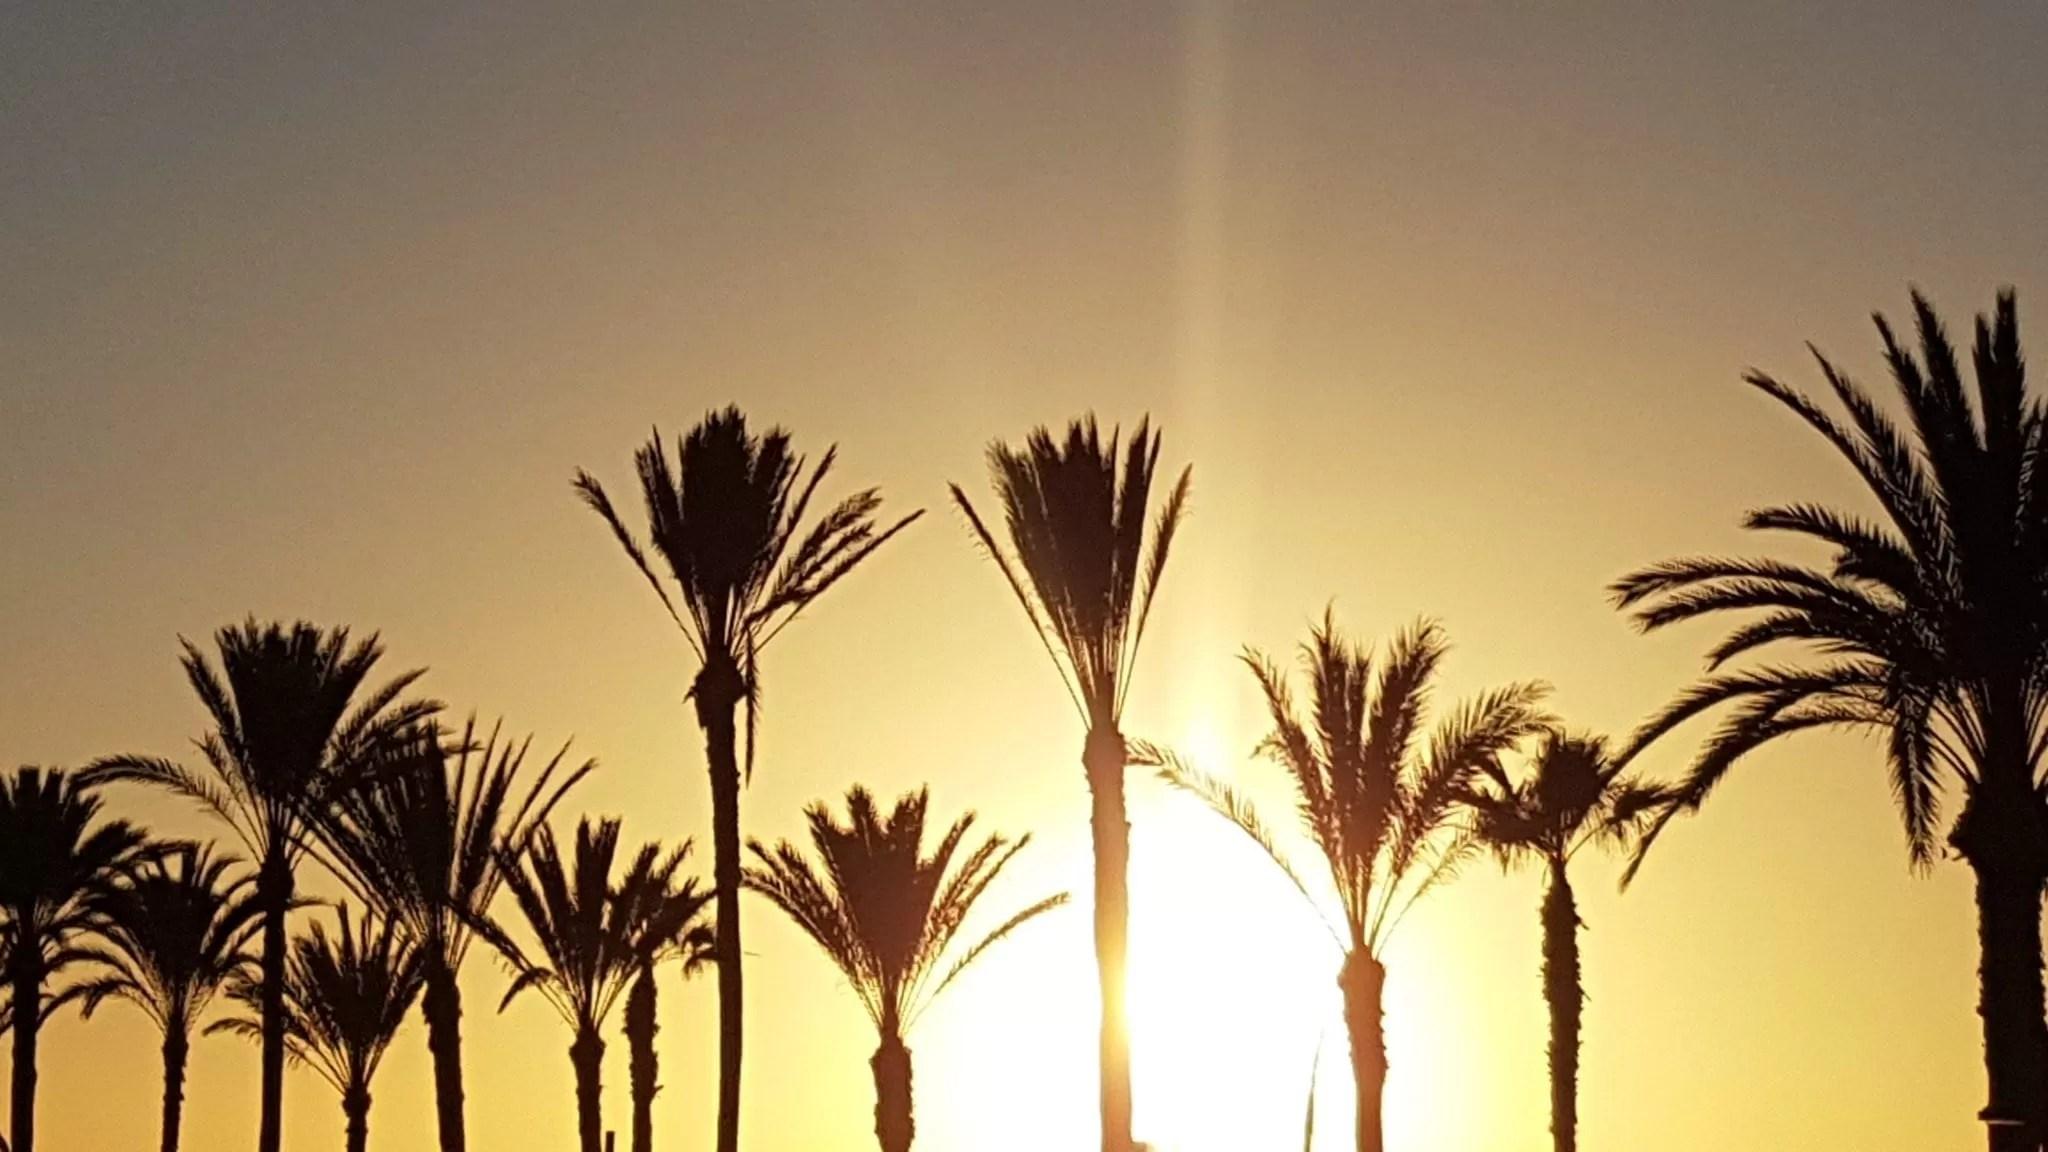 sunset at playa de las americas, tenerife